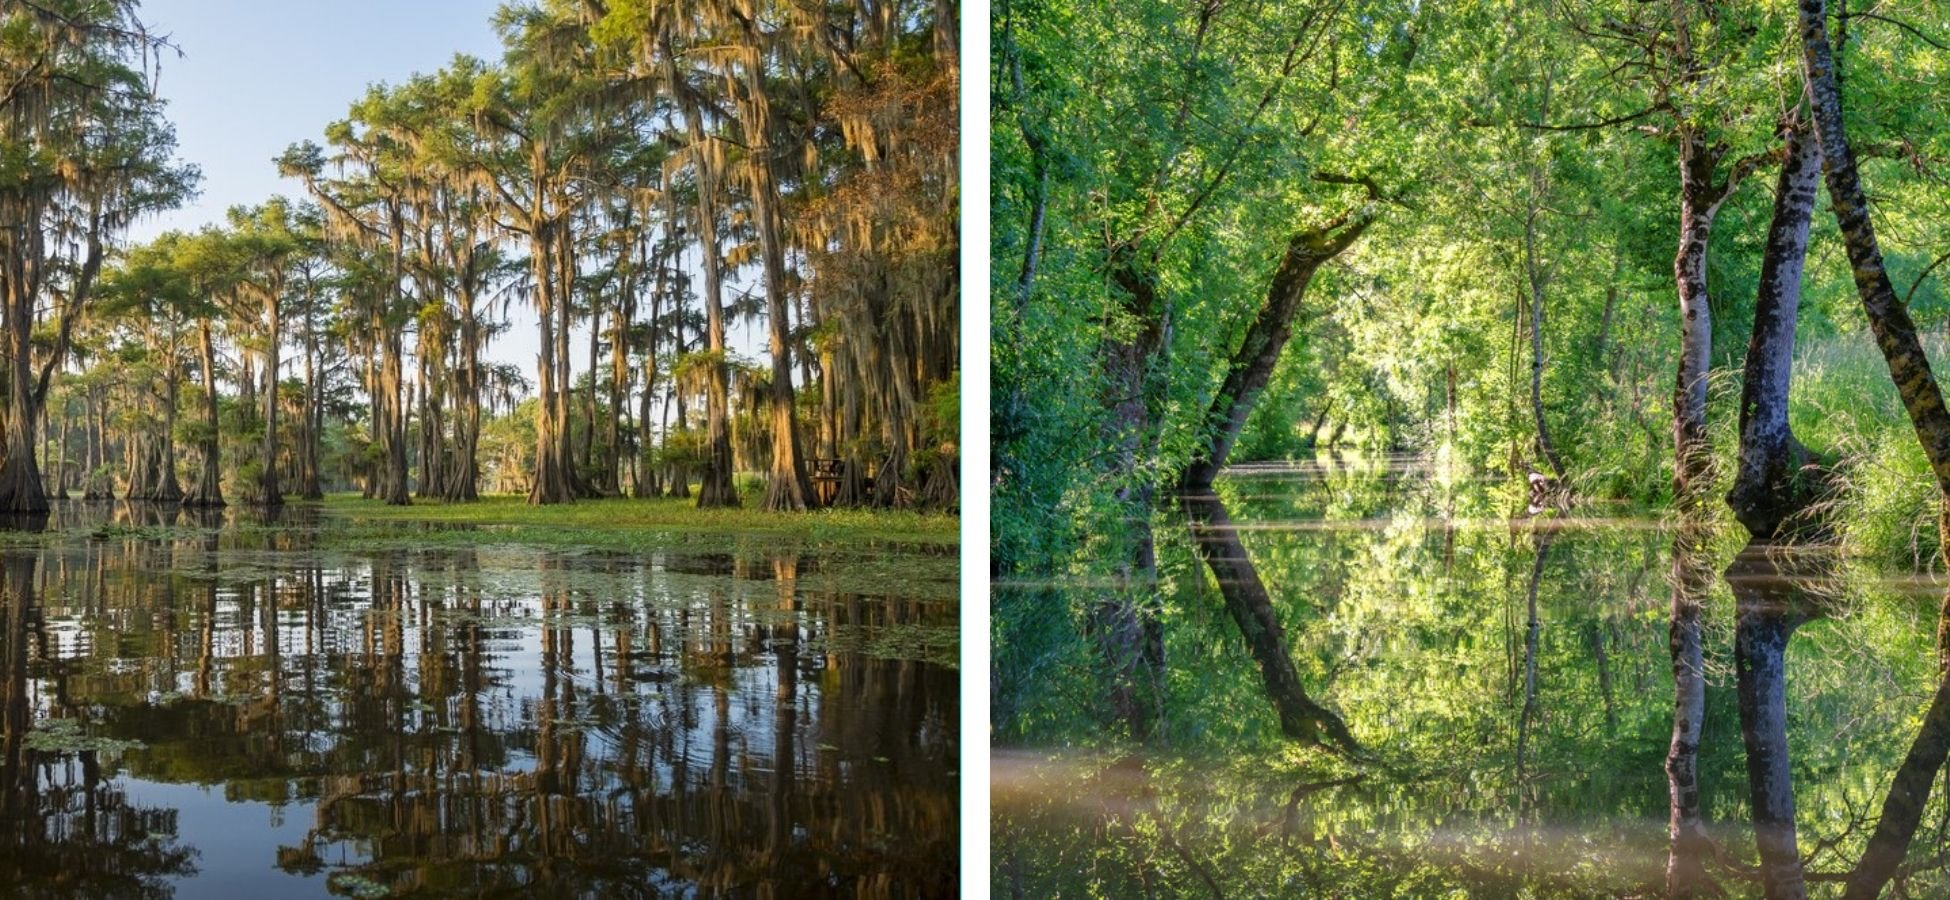 Le Bayou et le Marais poitevin